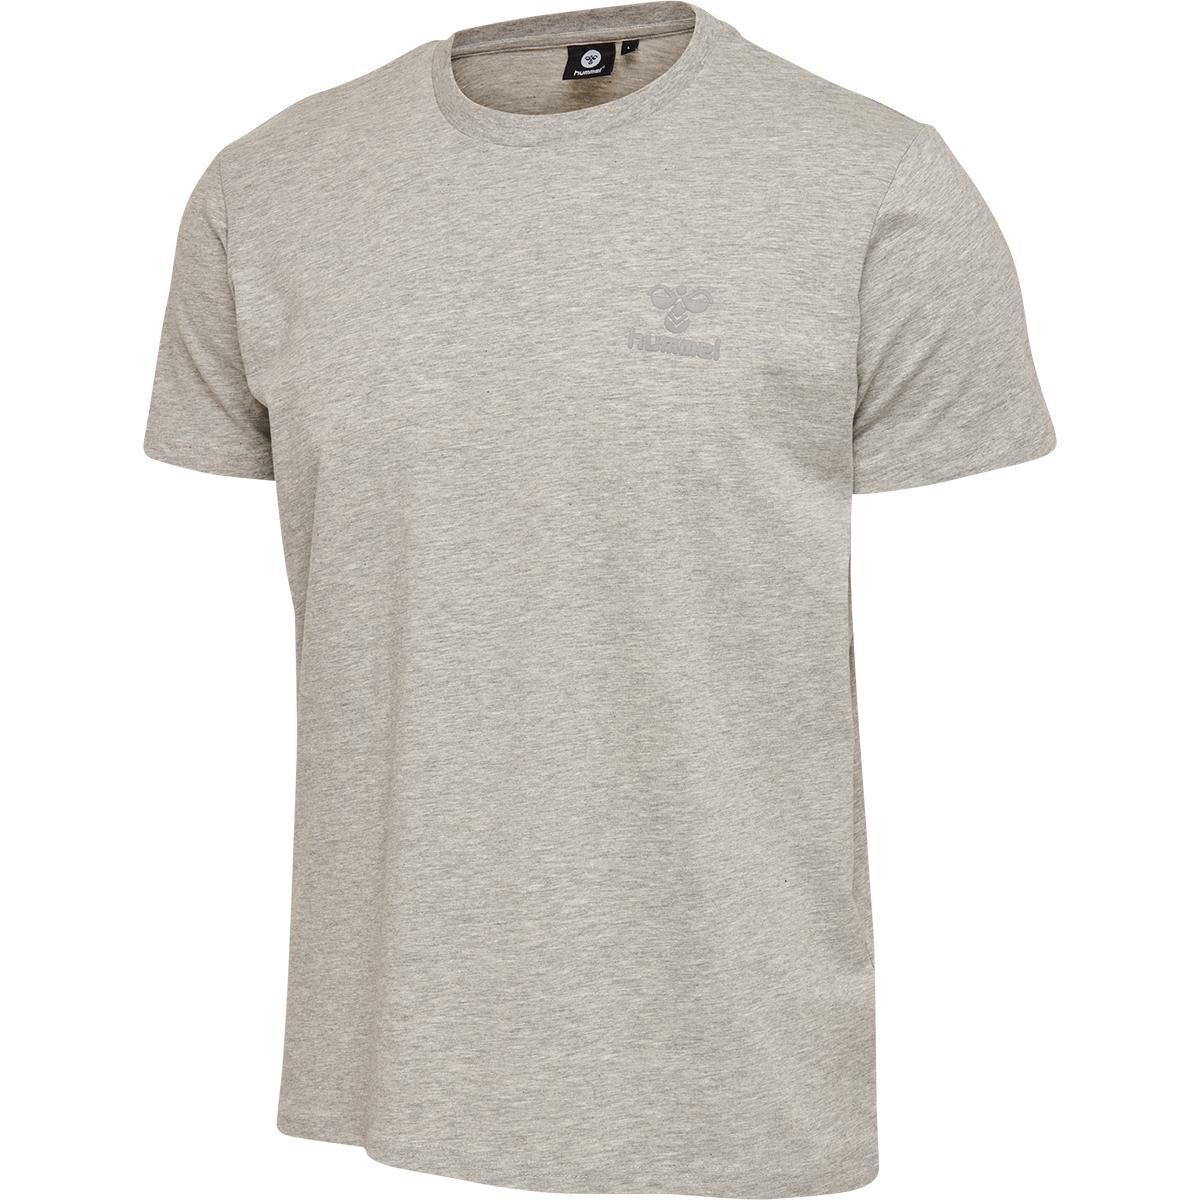 Hummel Sigge t-shirt